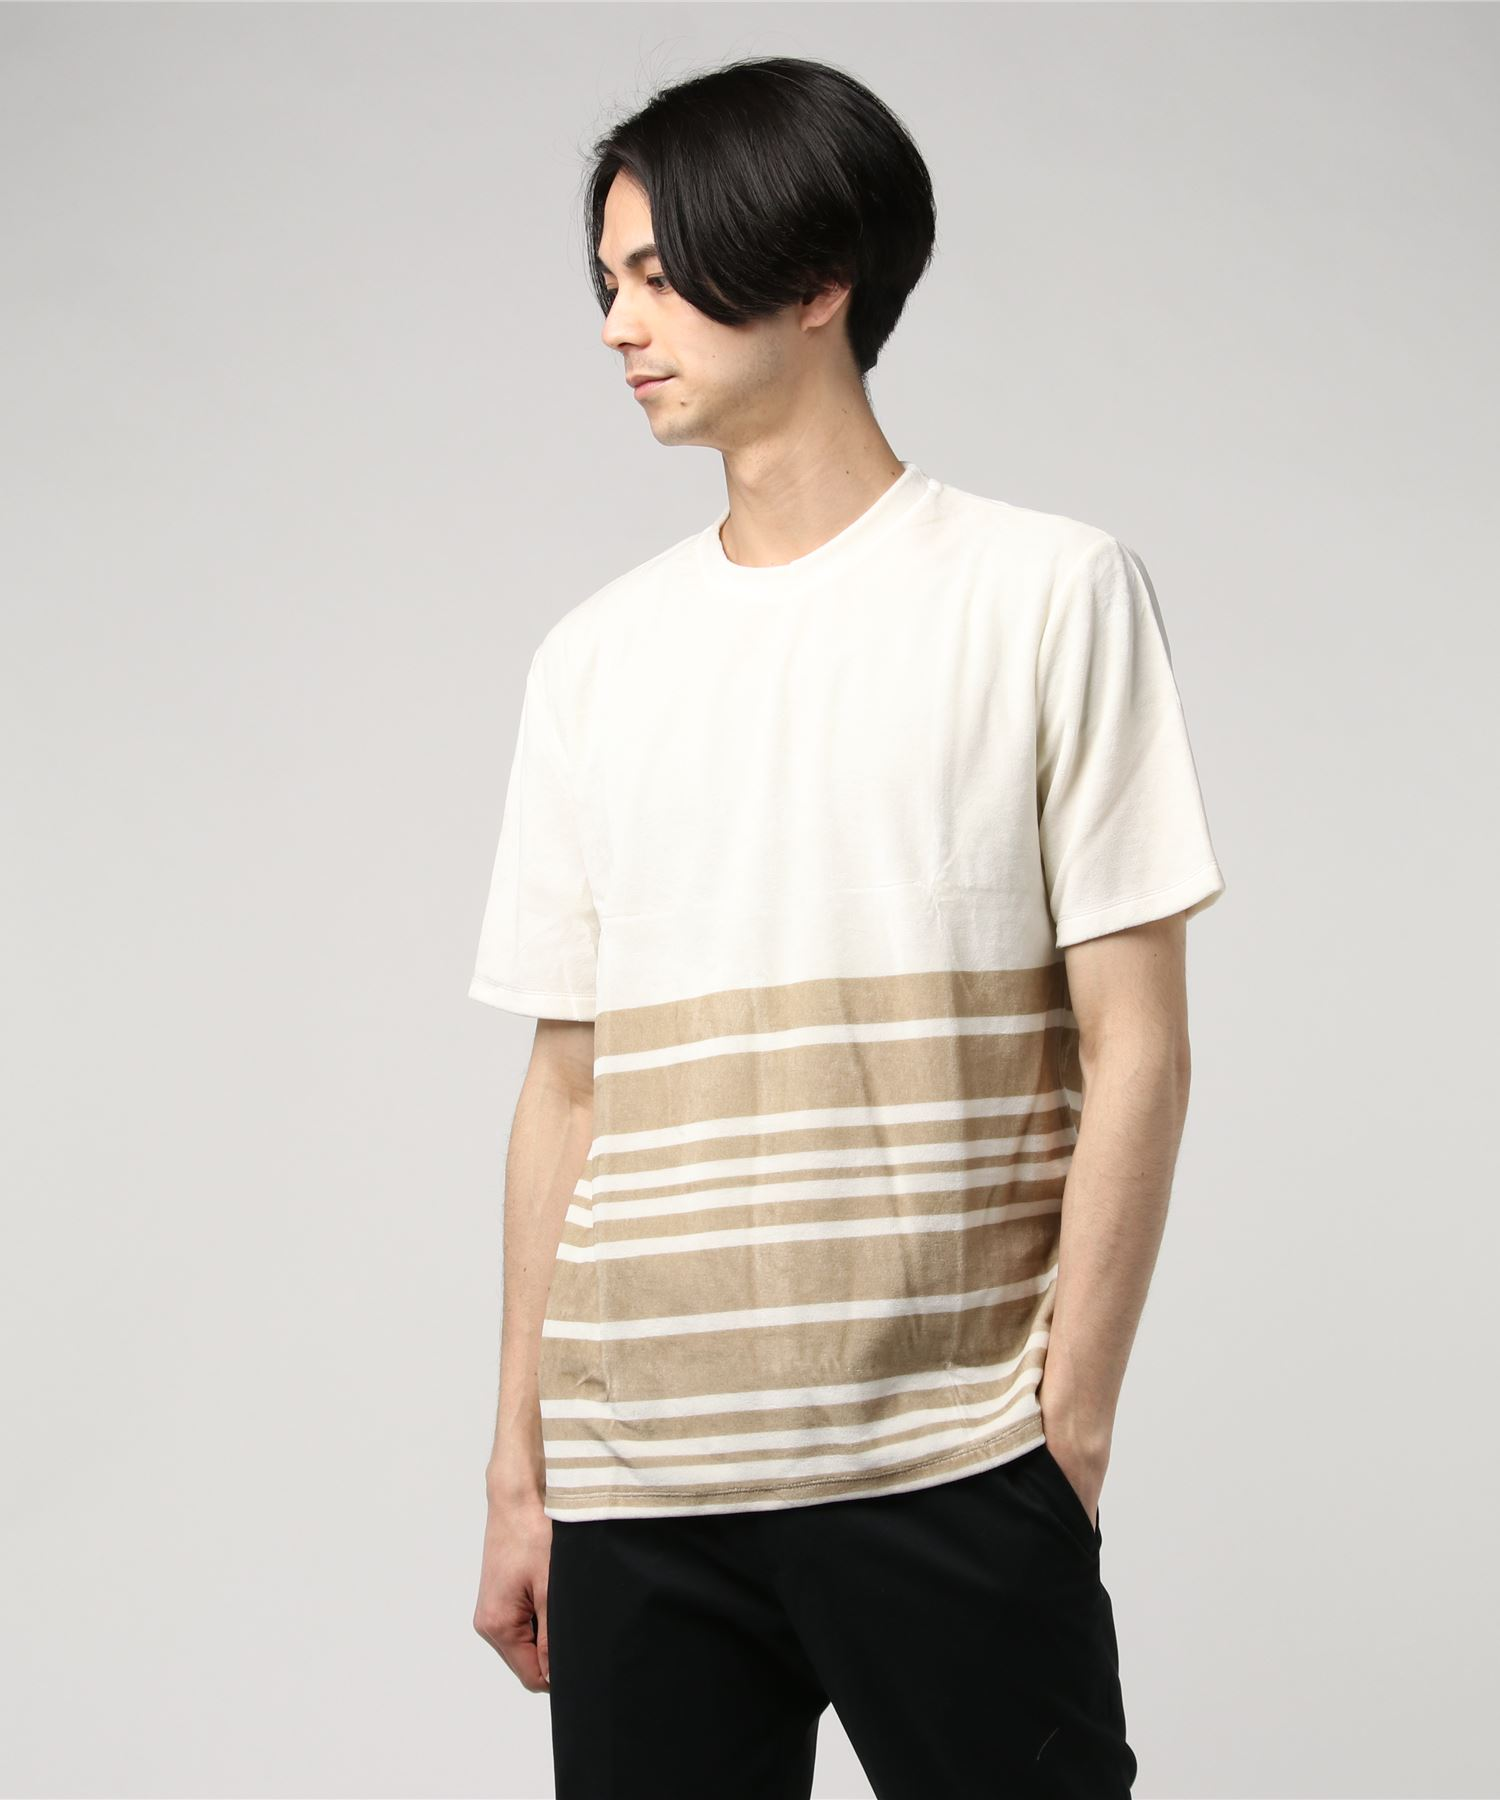 SOUTH YERN / ショートスリーブハーフボーダーTシャツ